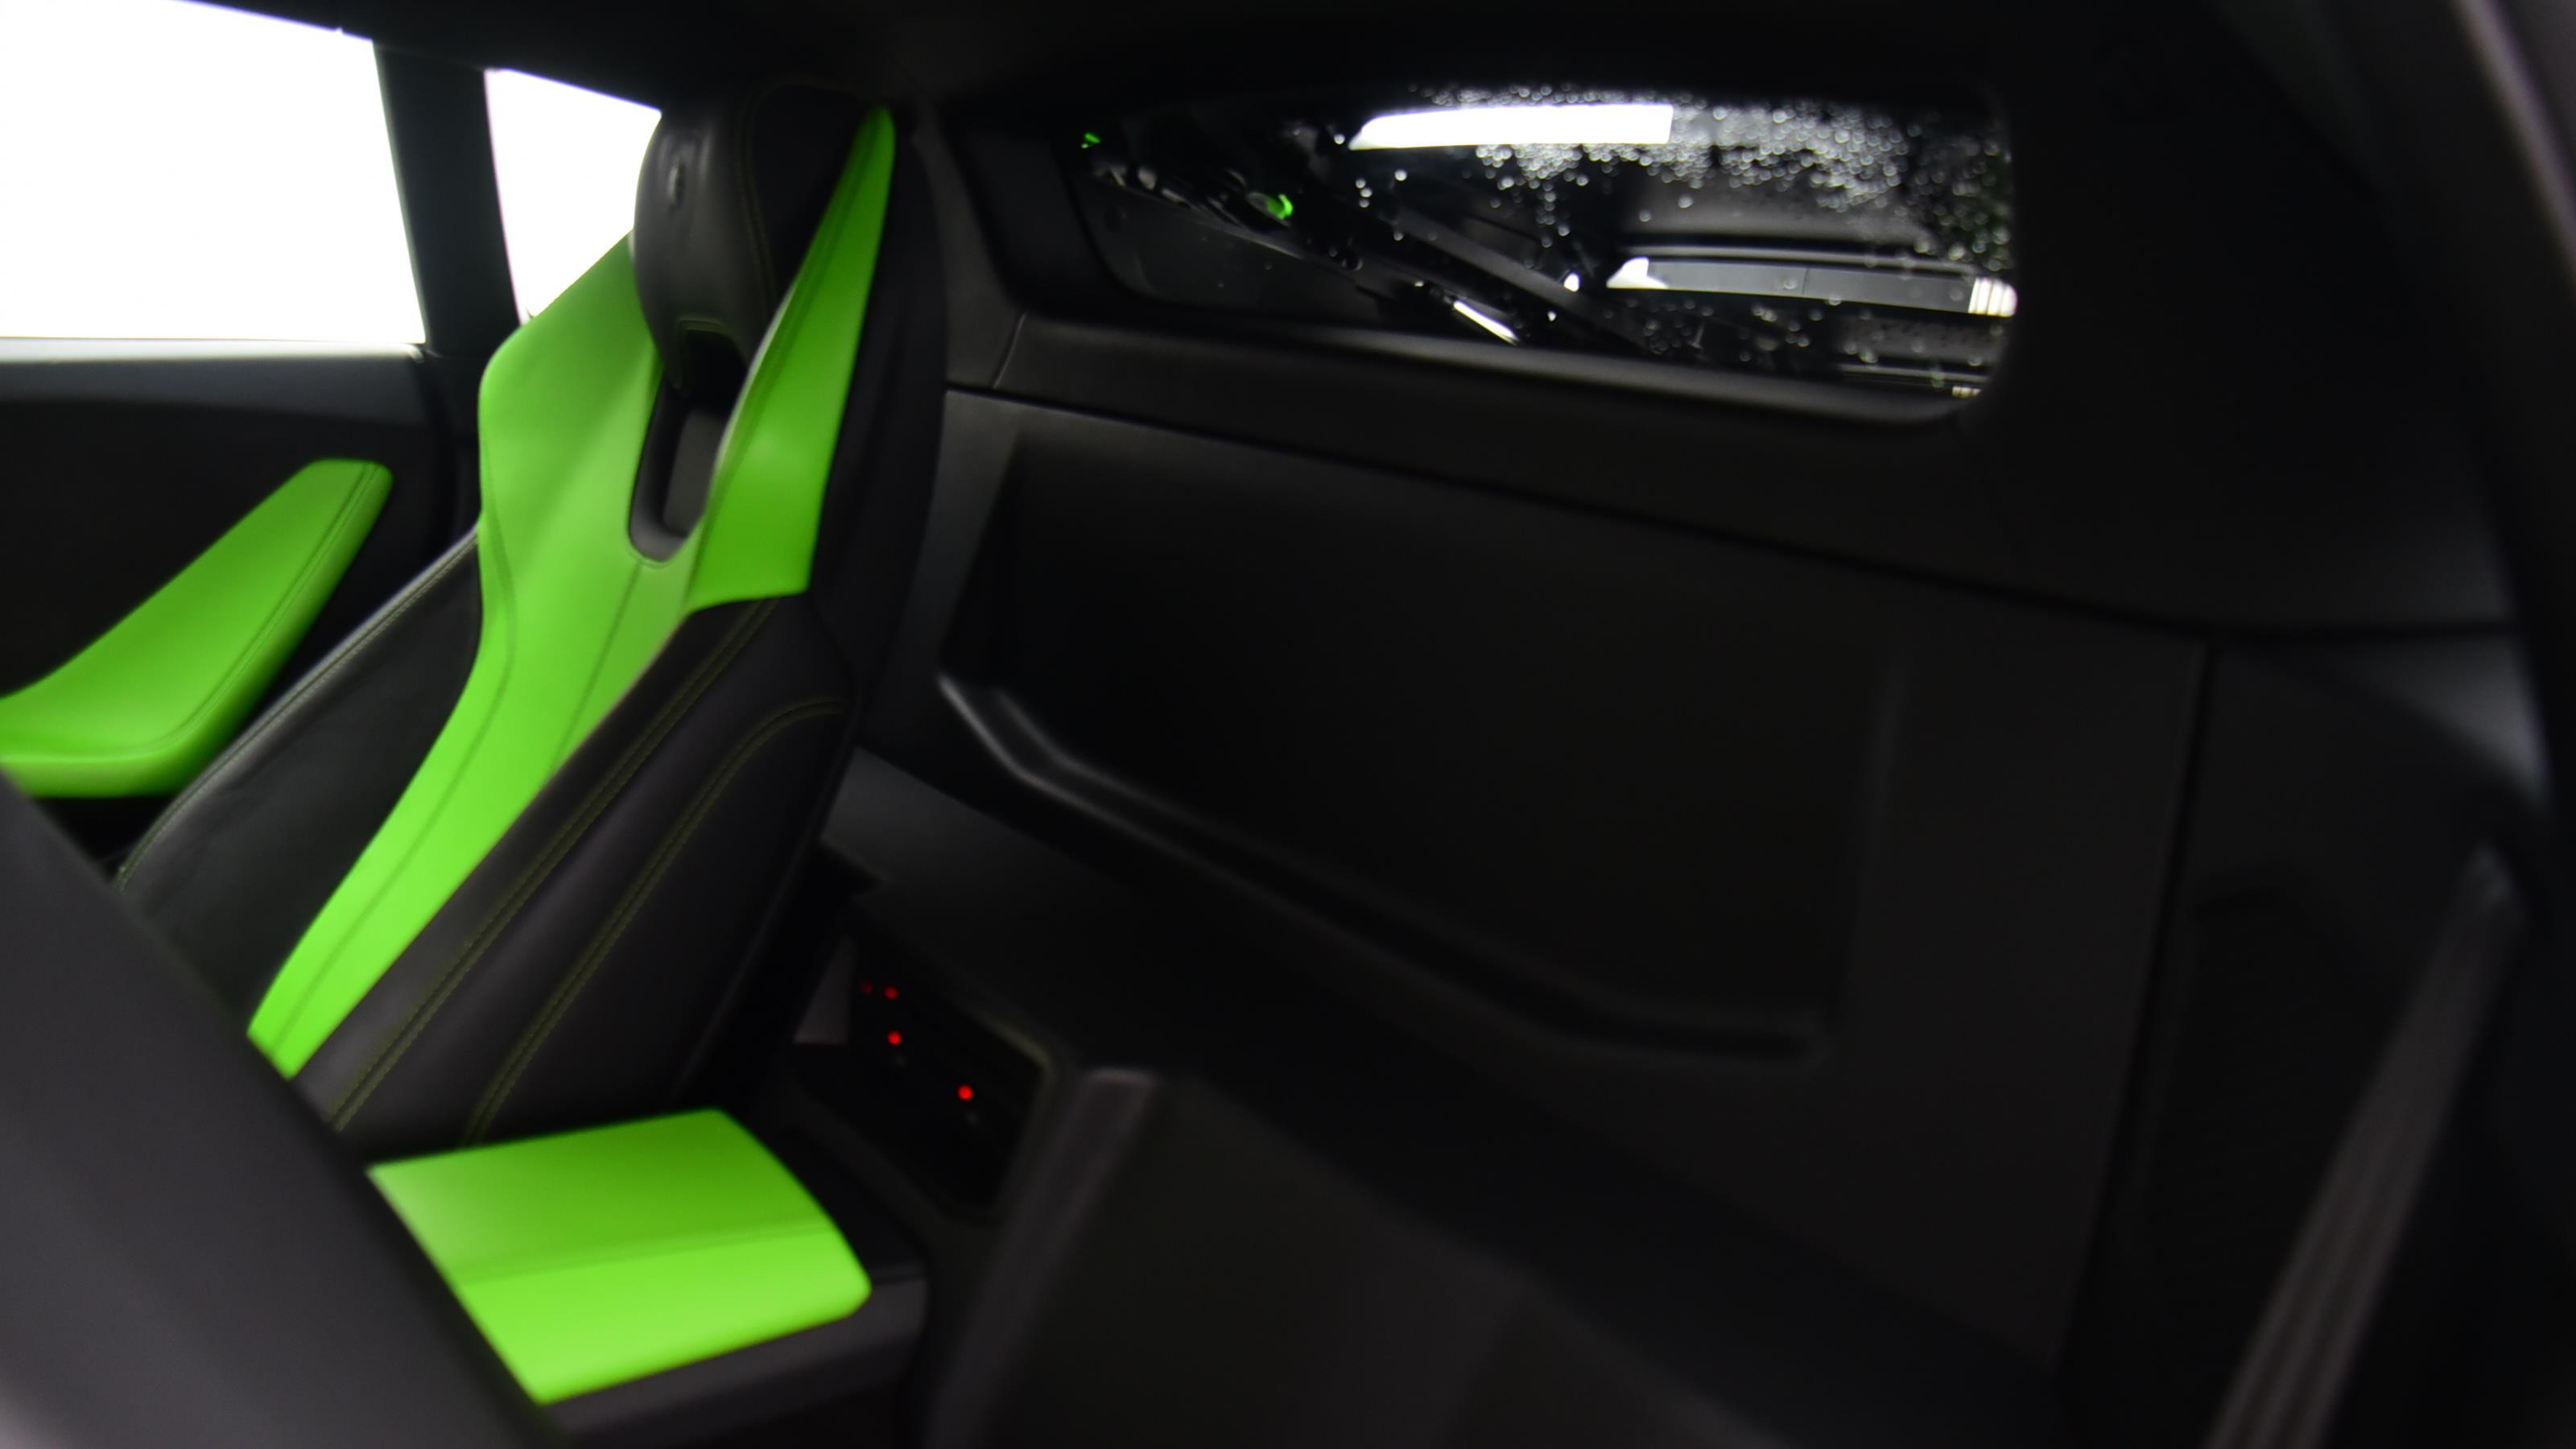 Used 2014 Lamborghini HURACAN LP 610-4 2dr LDF GREEN at Saxton4x4